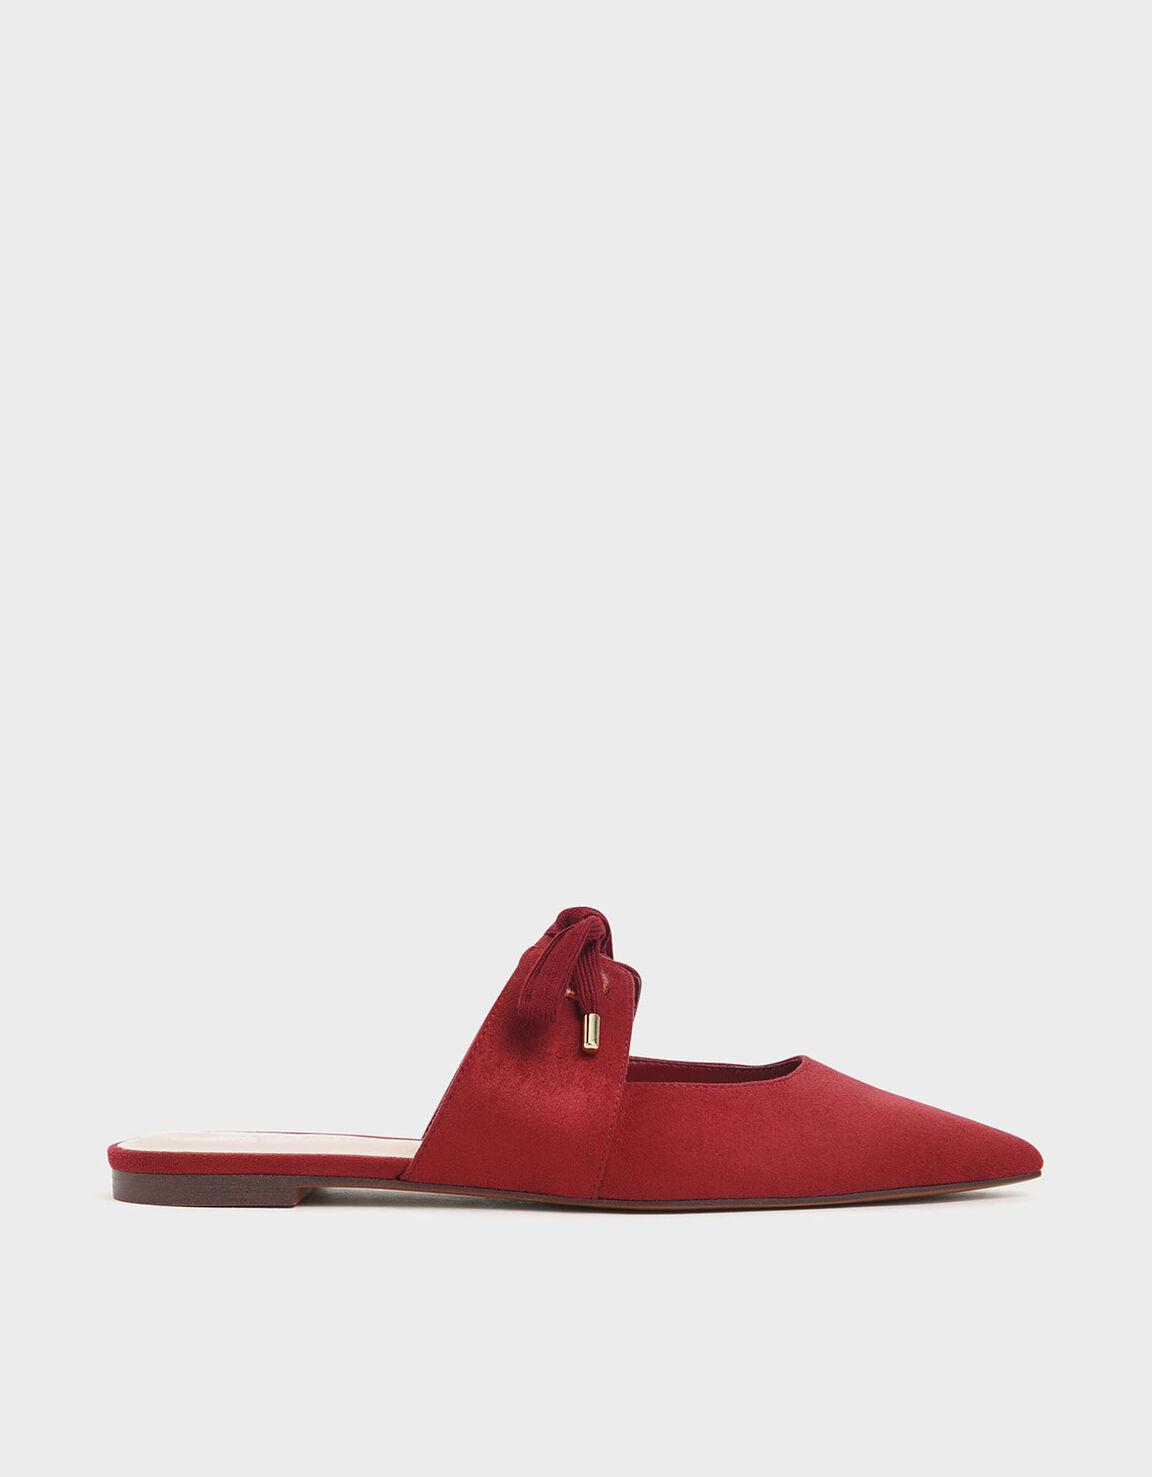 CHARLES & KEITH 鞋款低至34折優惠!:第9張圖片